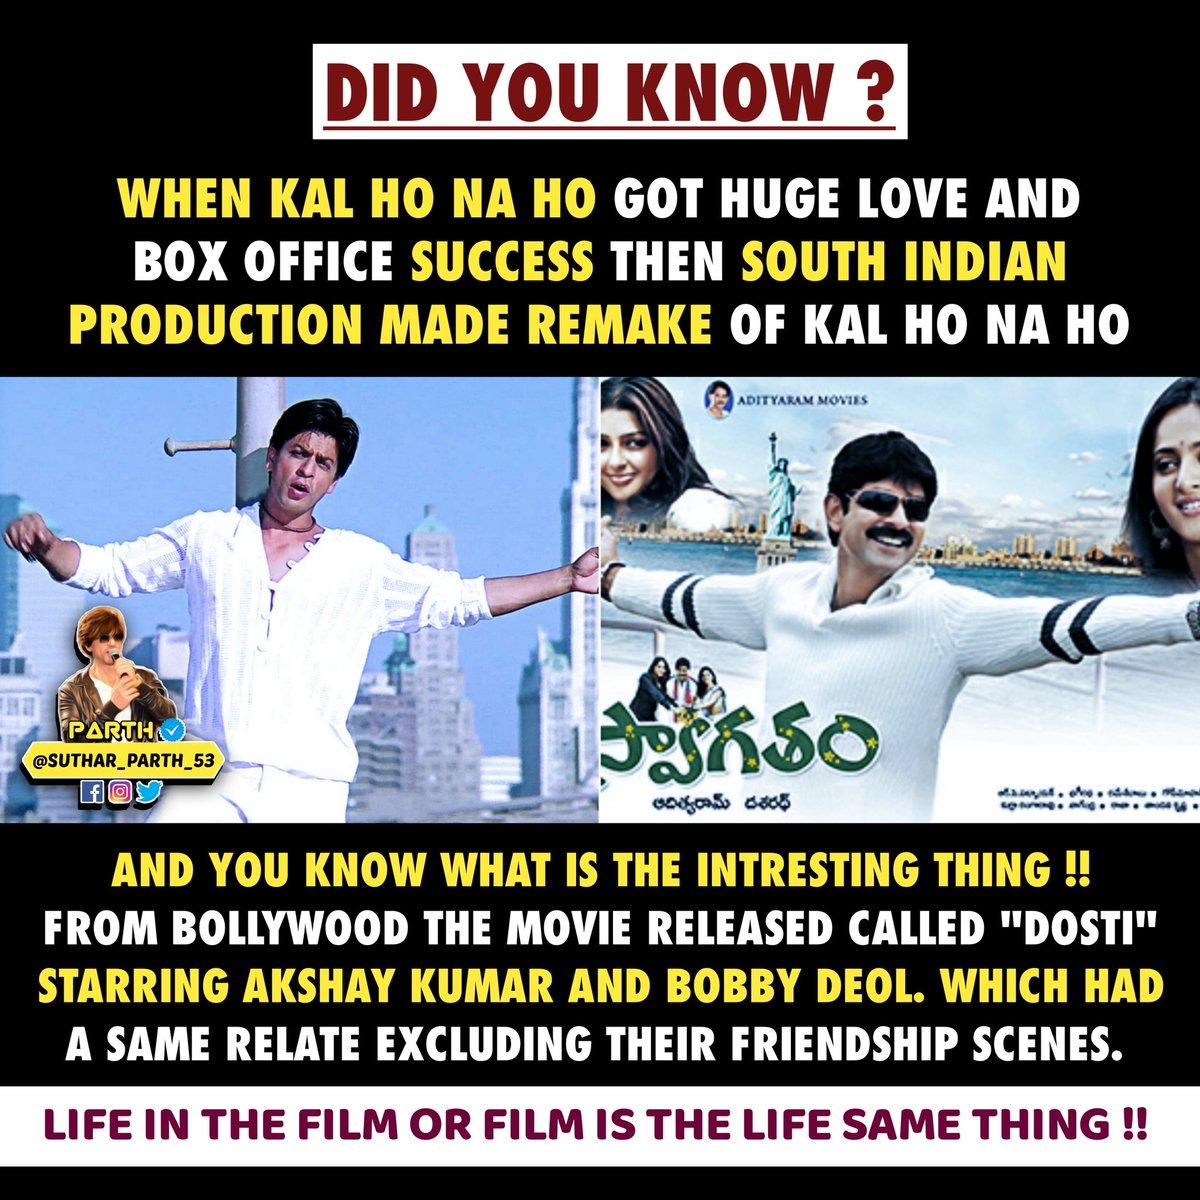 #17YearsOfKalHoNaaHo @iamsrk @realpreityzinta @karanjohar #SaifAliKhan Thank you for This Iconic Movie ❤️ @SutharParth_53